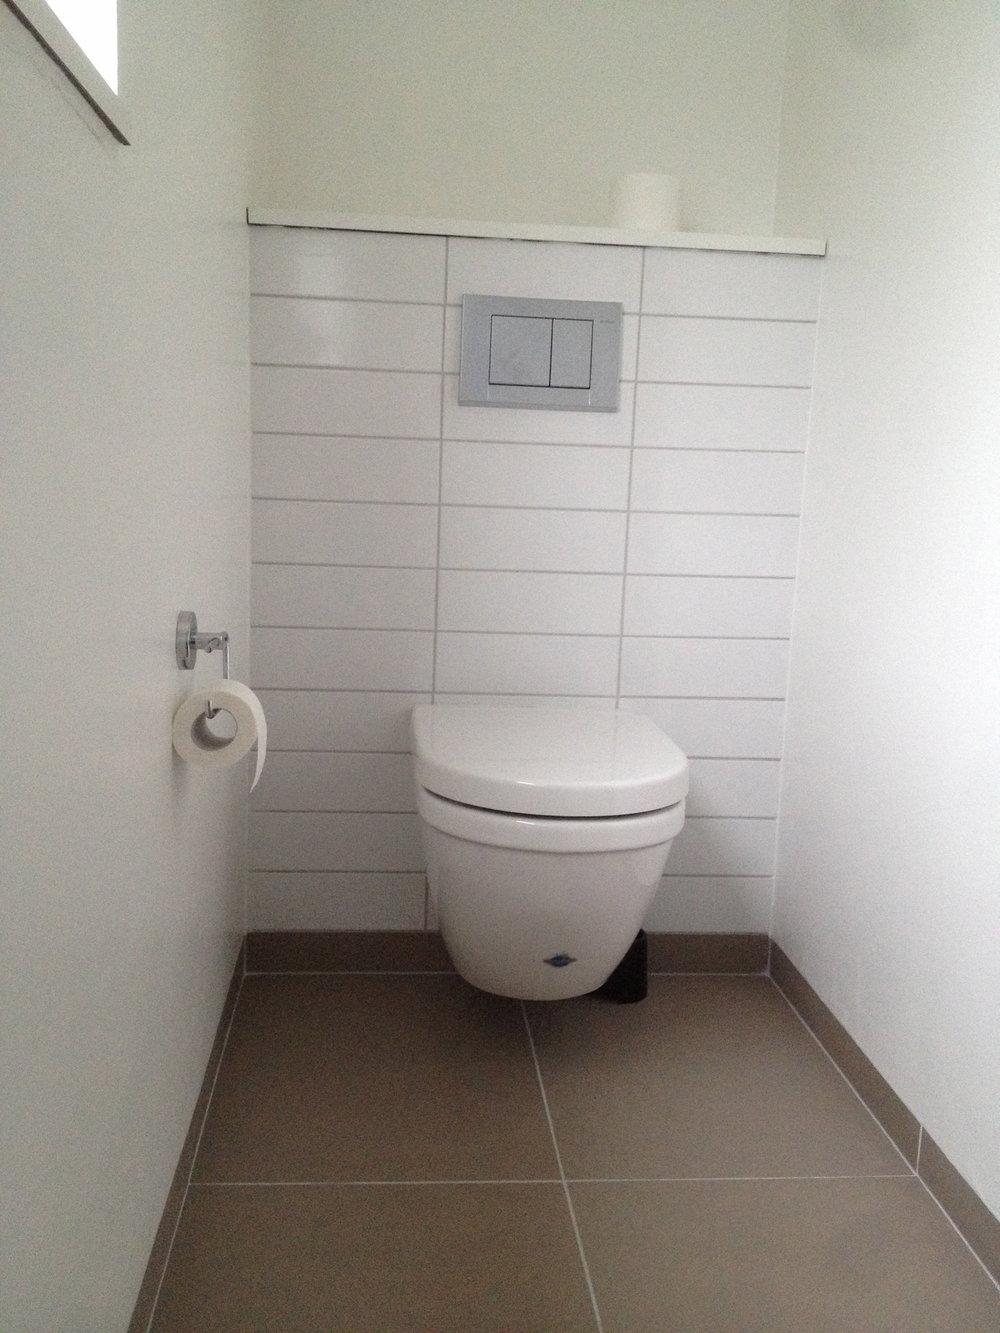 Sommerhus nybyg toilet.jpg